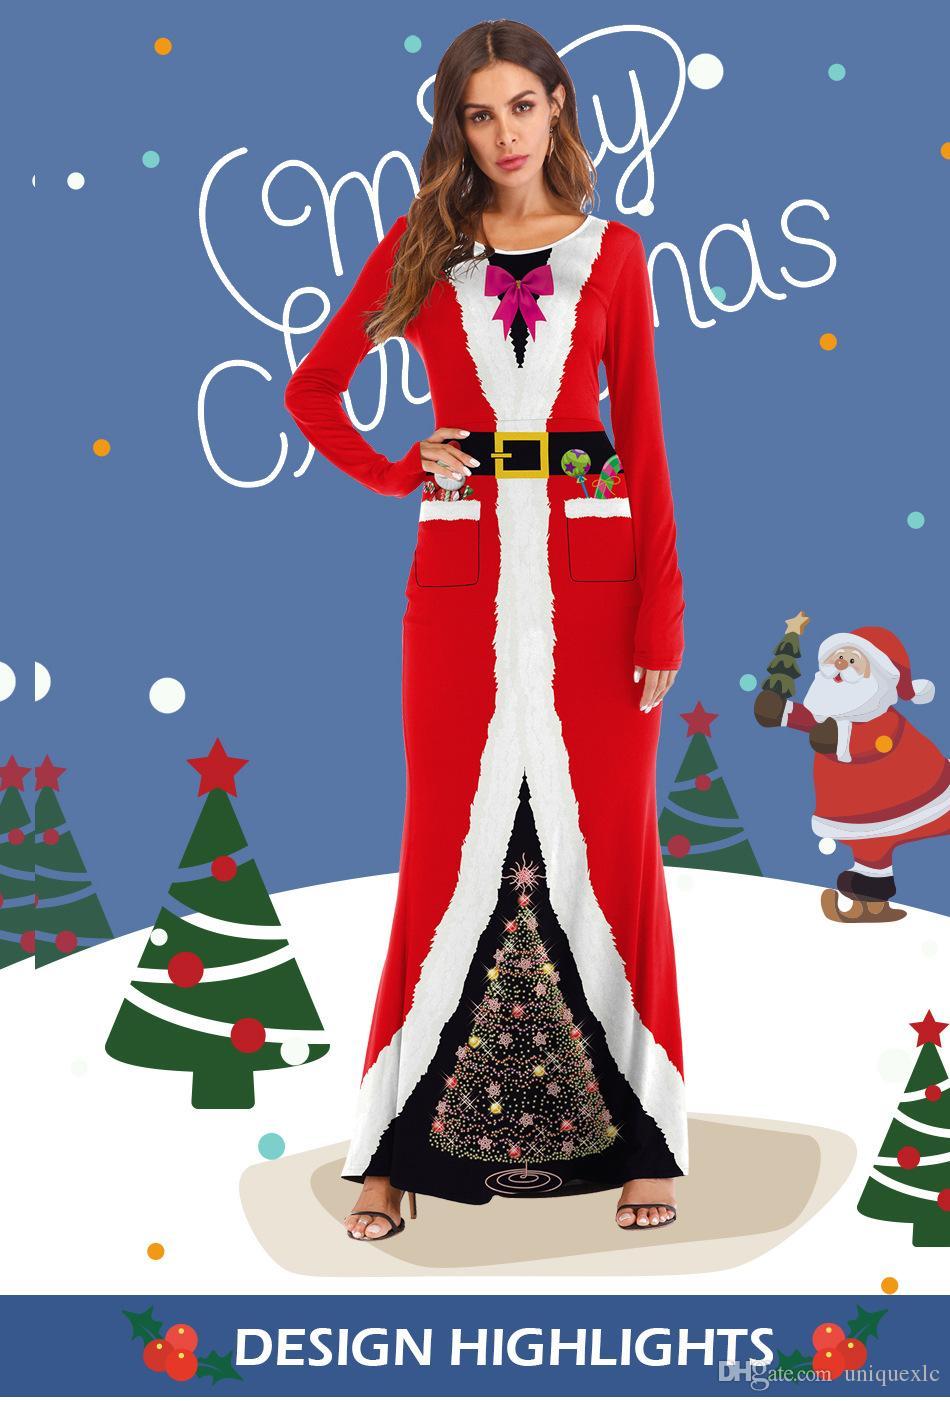 d1a3e9c0cd4 Christmas Costumes COS Dress Up Balls Santa Print Adult Dress One Colors  90% Cotton Drop Shipping Cosplay Christmas Costumes Adult Dress Online with  ...